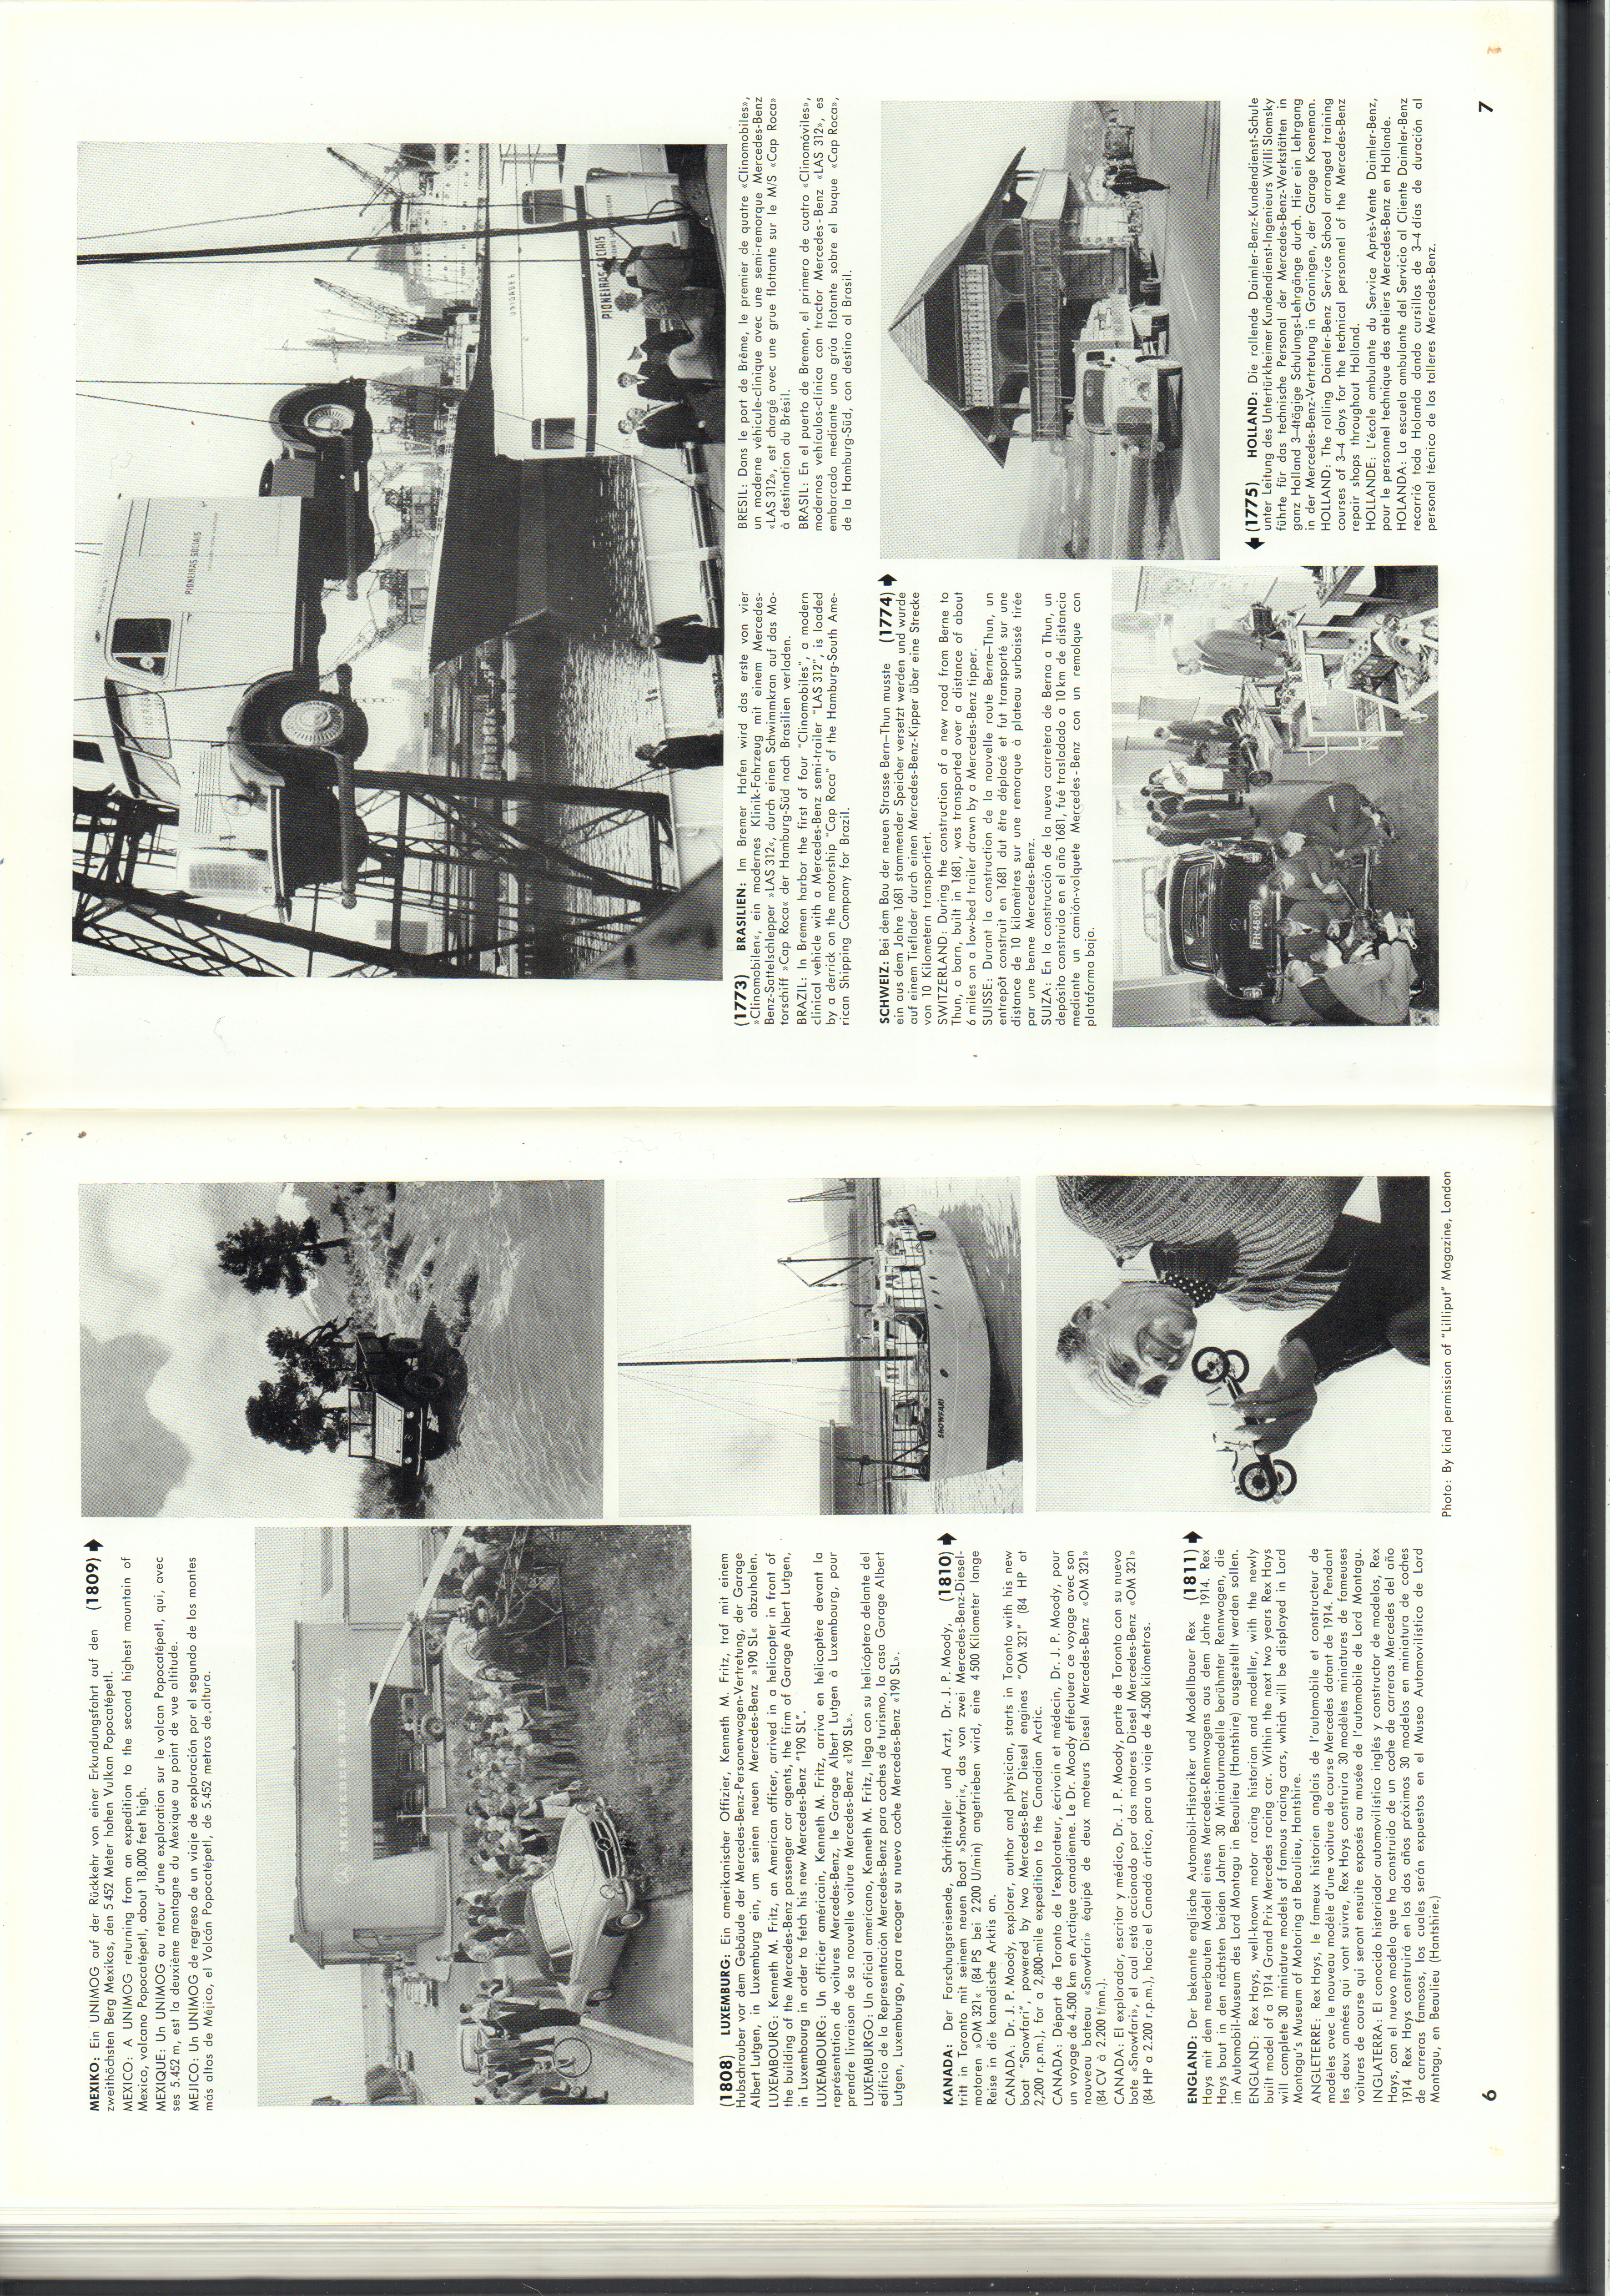 (REVISTA): Periódico In aller welt n.º 14 - Mercedes-Benz no mundo - 1957 - multilingue 004